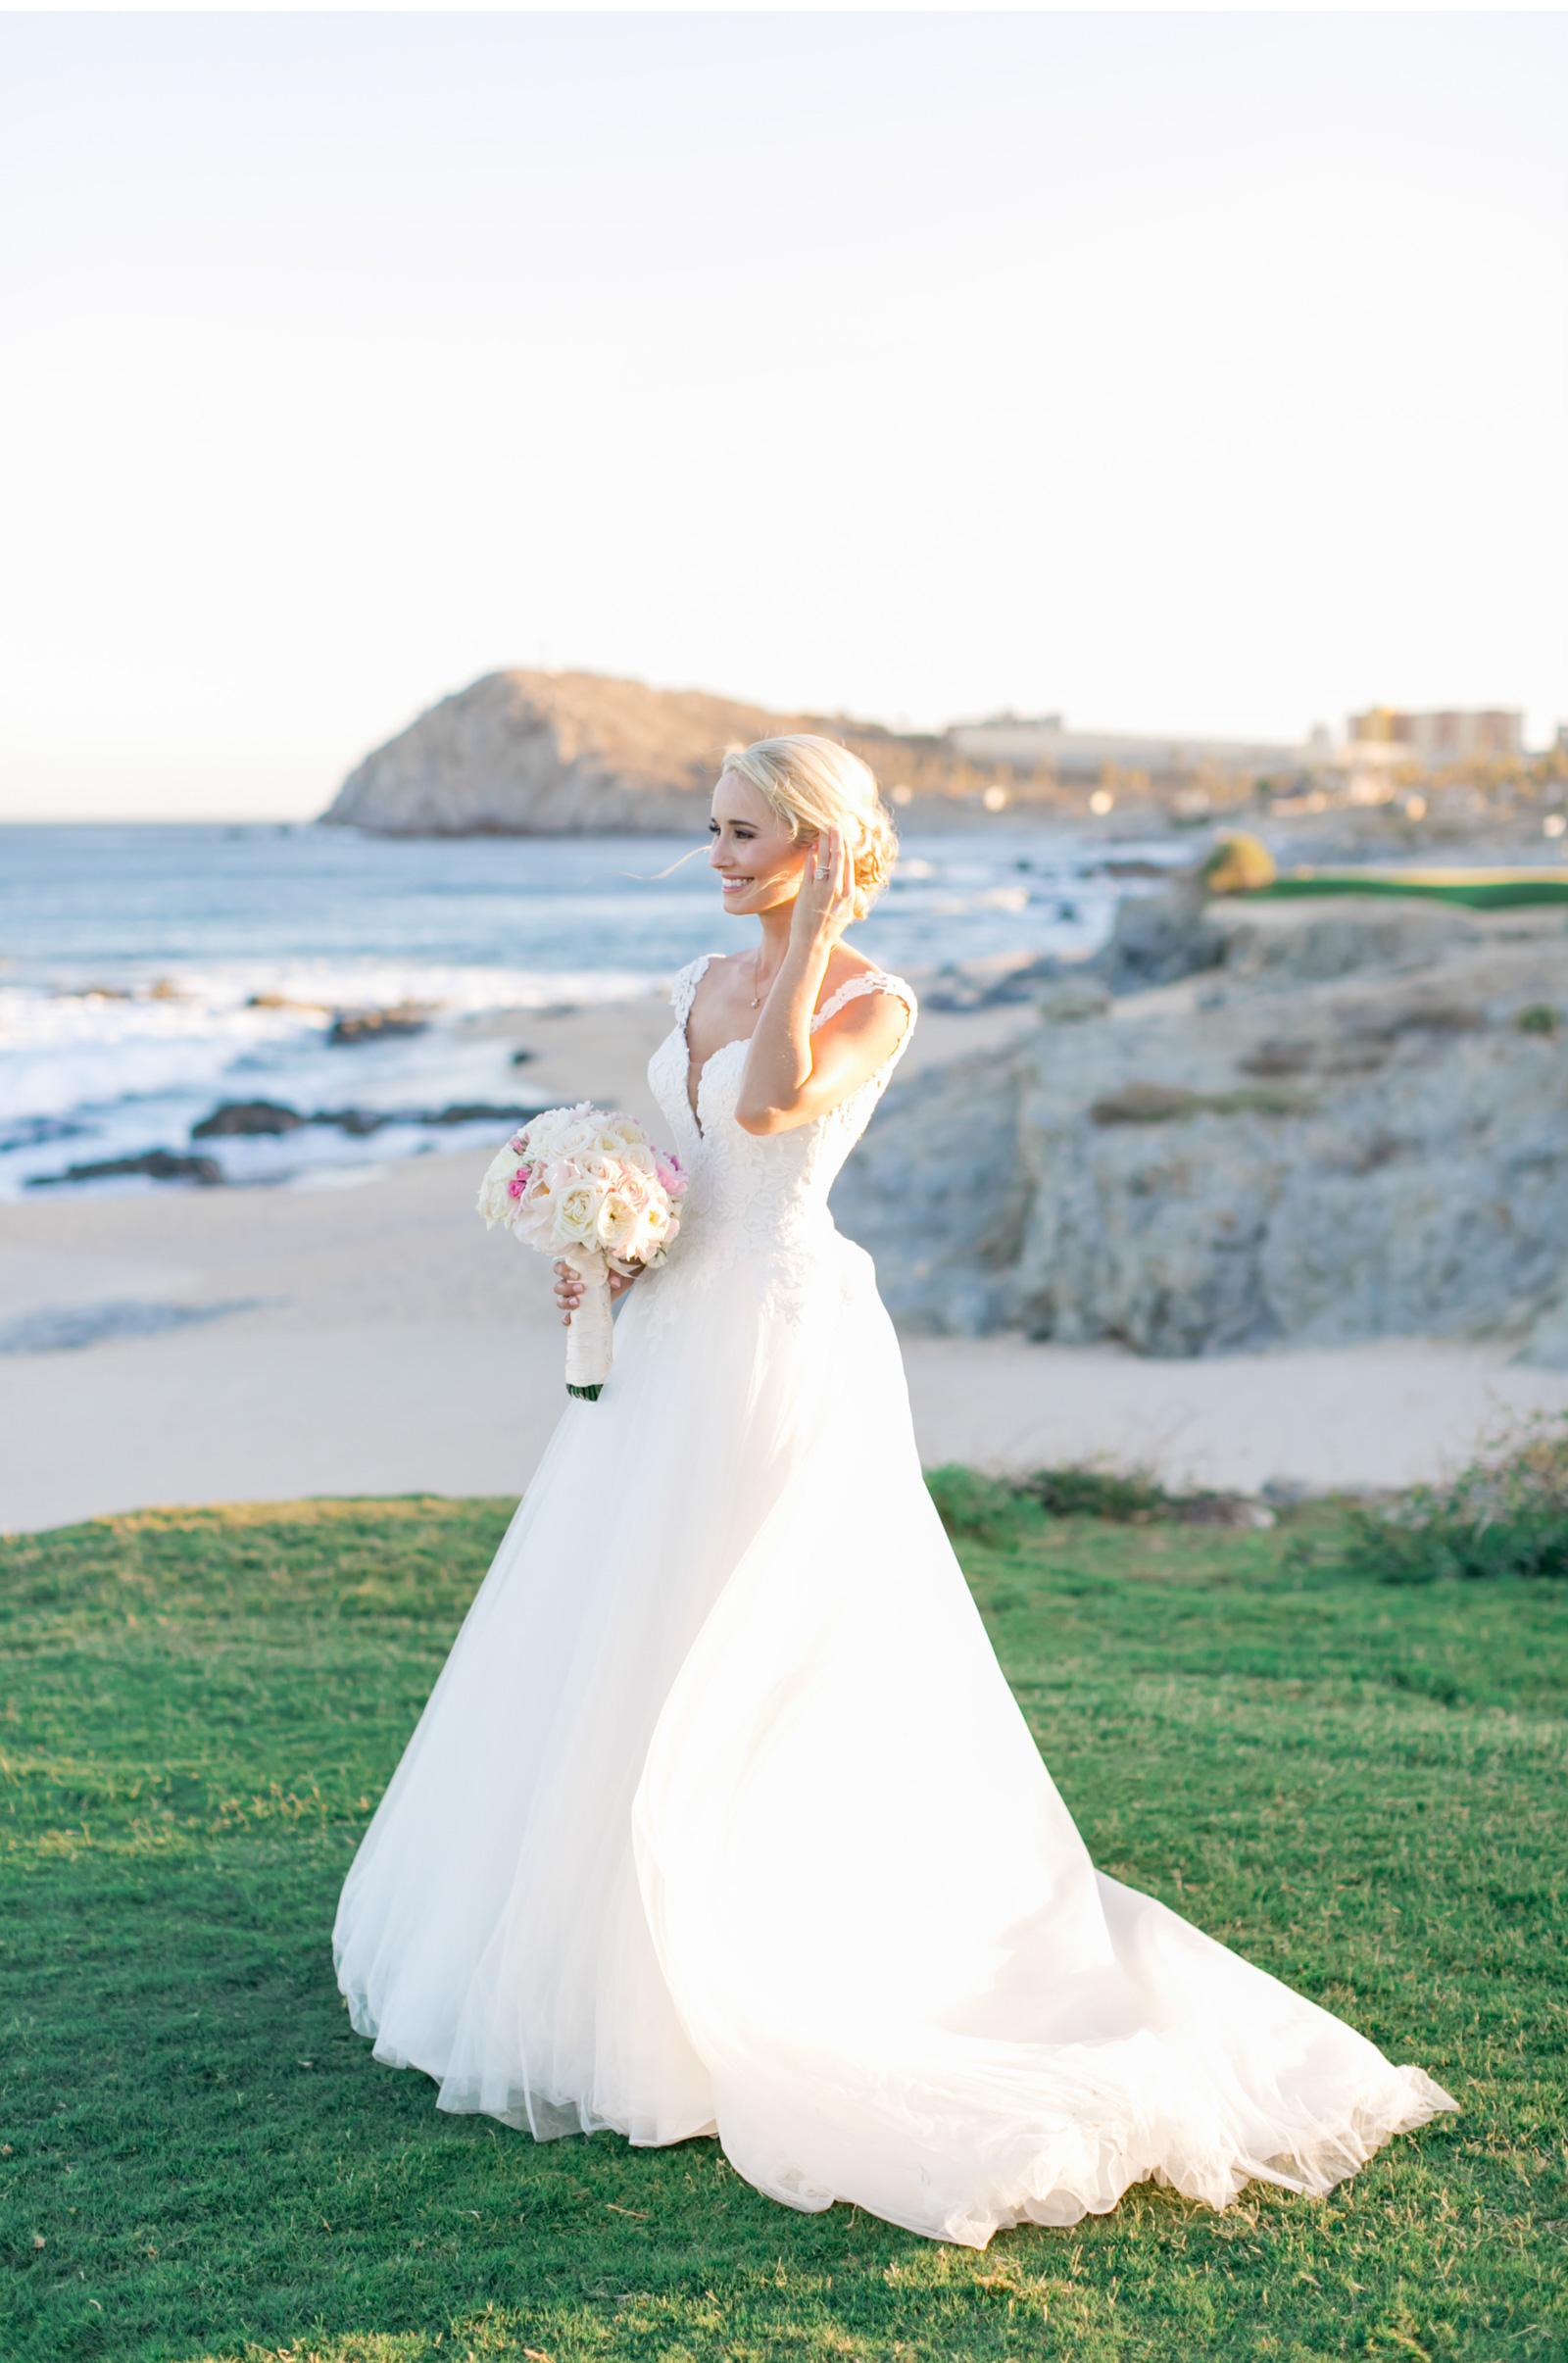 Hawaii-Destination-Wedding-Natalie-Schutt-Photography-Style-Me-Pretty_17.jpg